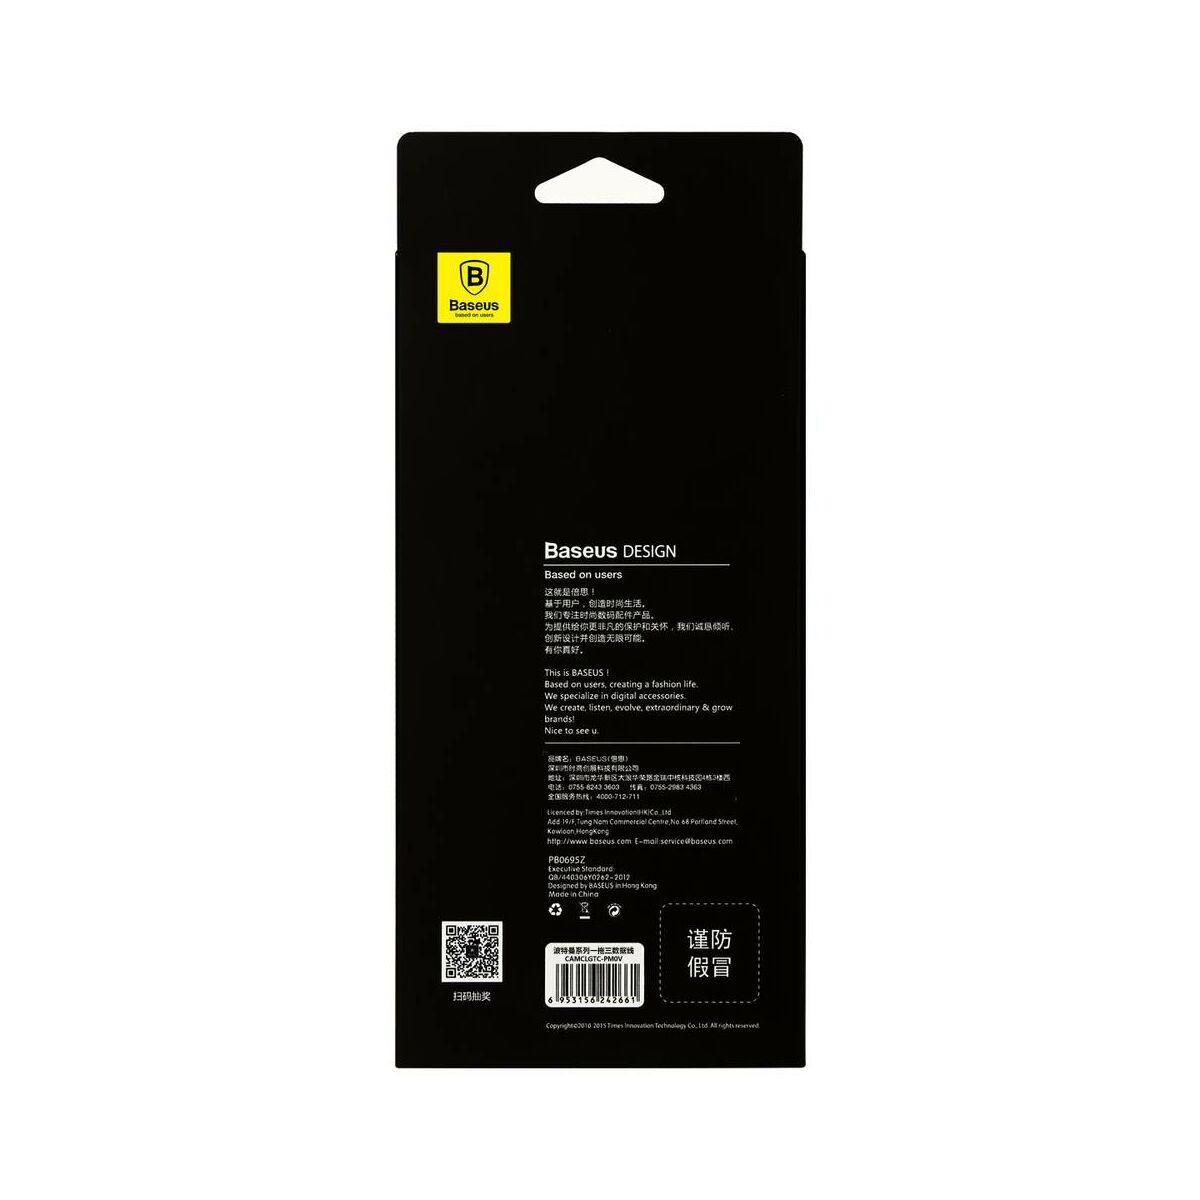 Baseus Univerzális kábel, Portman series, 3-in1 multifunkciós(micro USB + Lightning + Type-C), 2.1A, 1.2m, luxus arany (CAMCLGTC-PM0V)